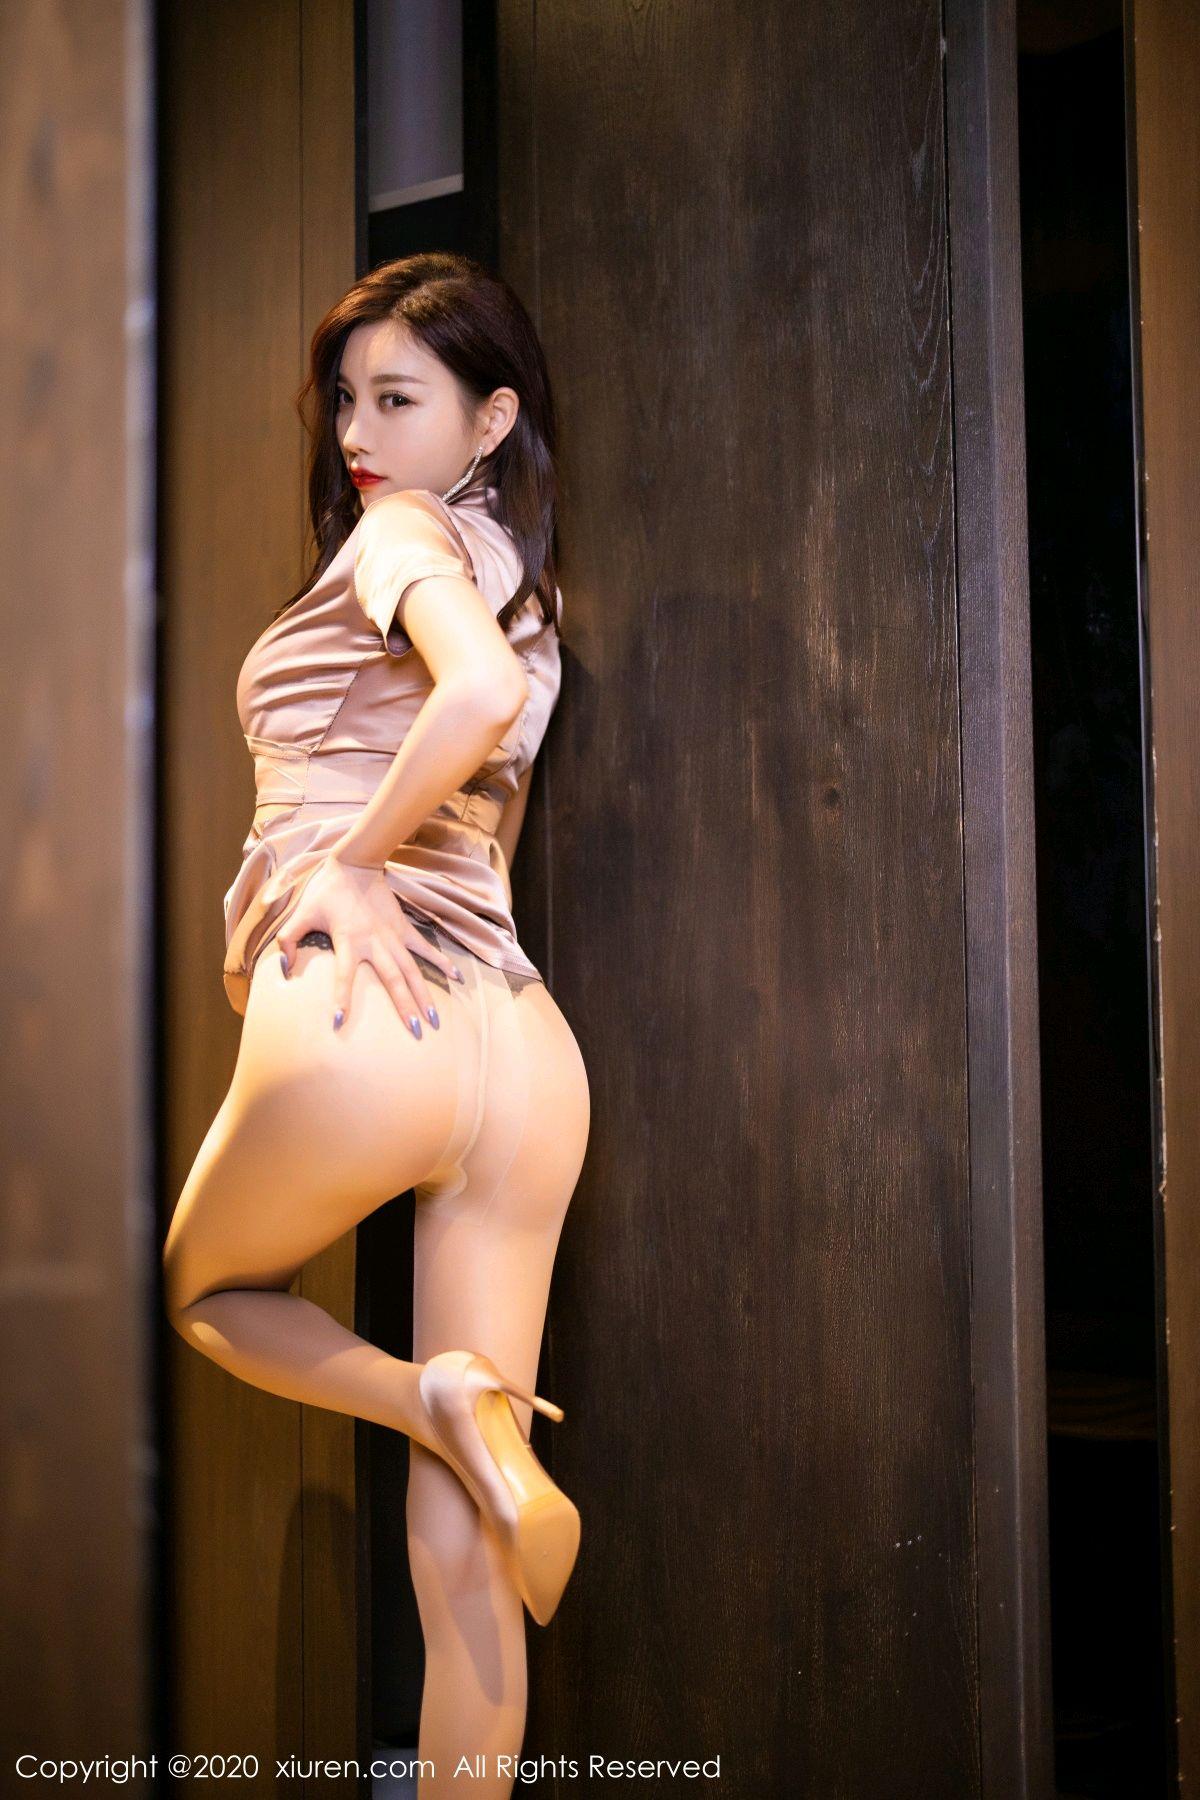 [XiuRen] Vol.2587 Yang Chen Chen 87P, Underwear, Xiuren, Yang Chen Chen